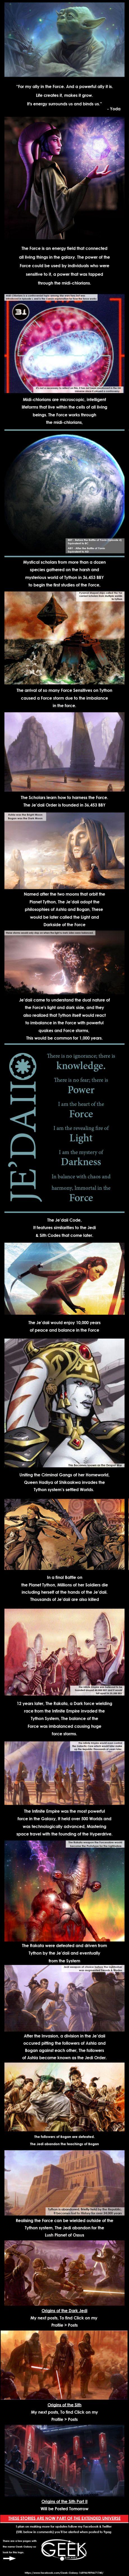 Origins of the Jedi